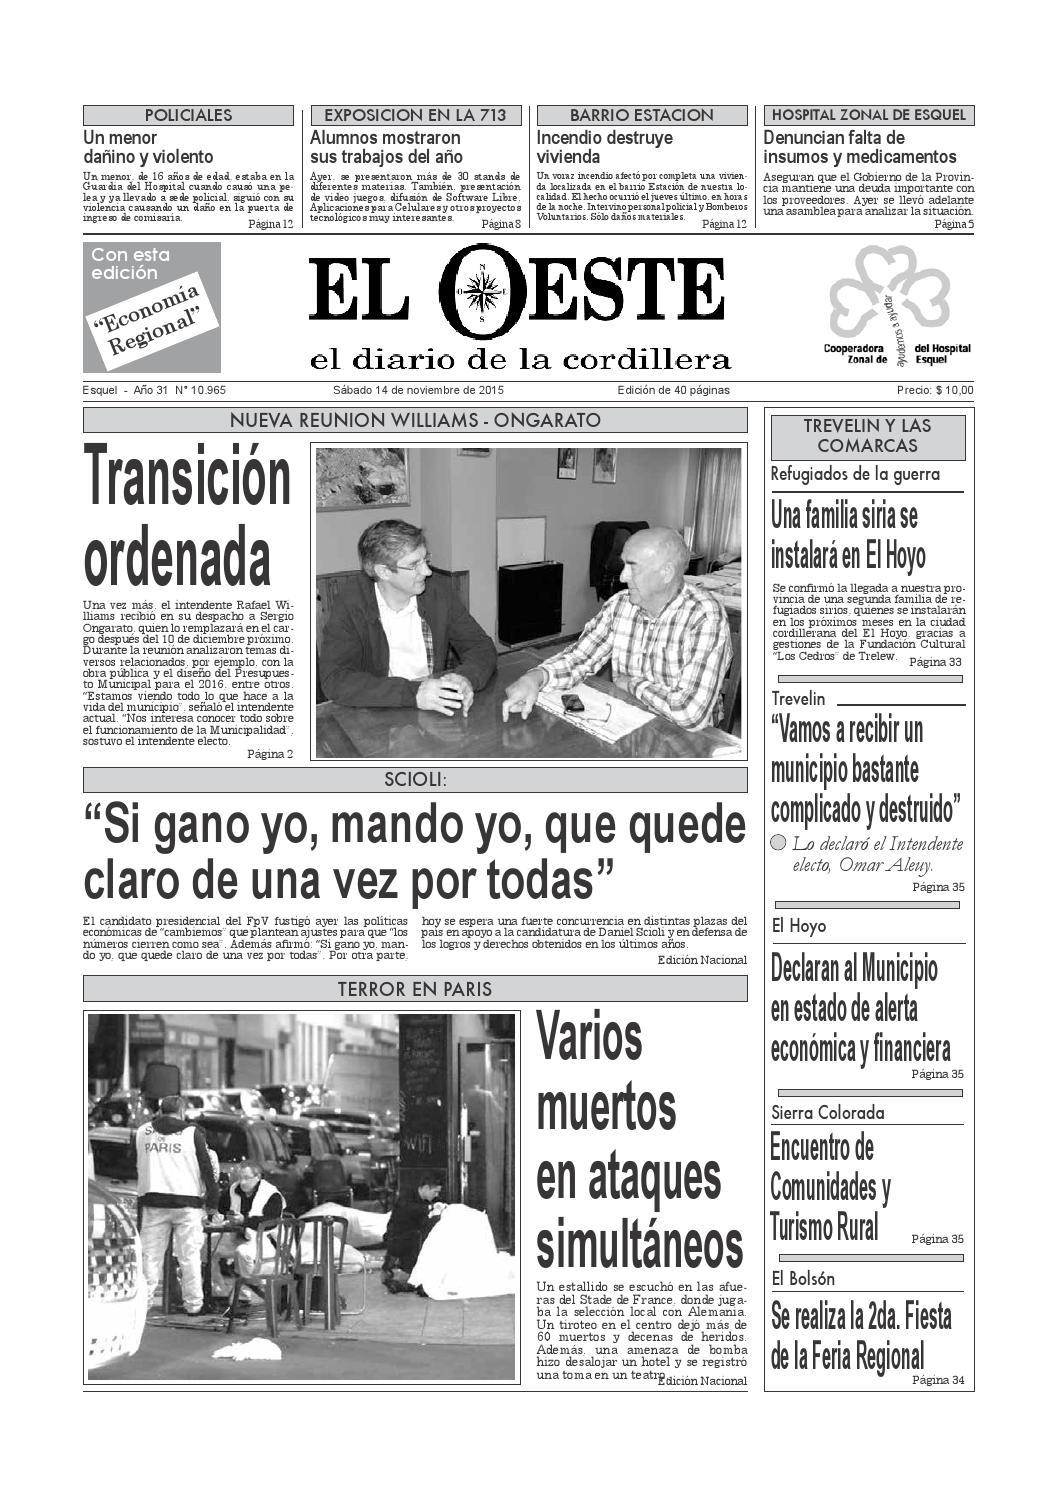 Oeste14 11 2015 by Roberto Pena - issuu